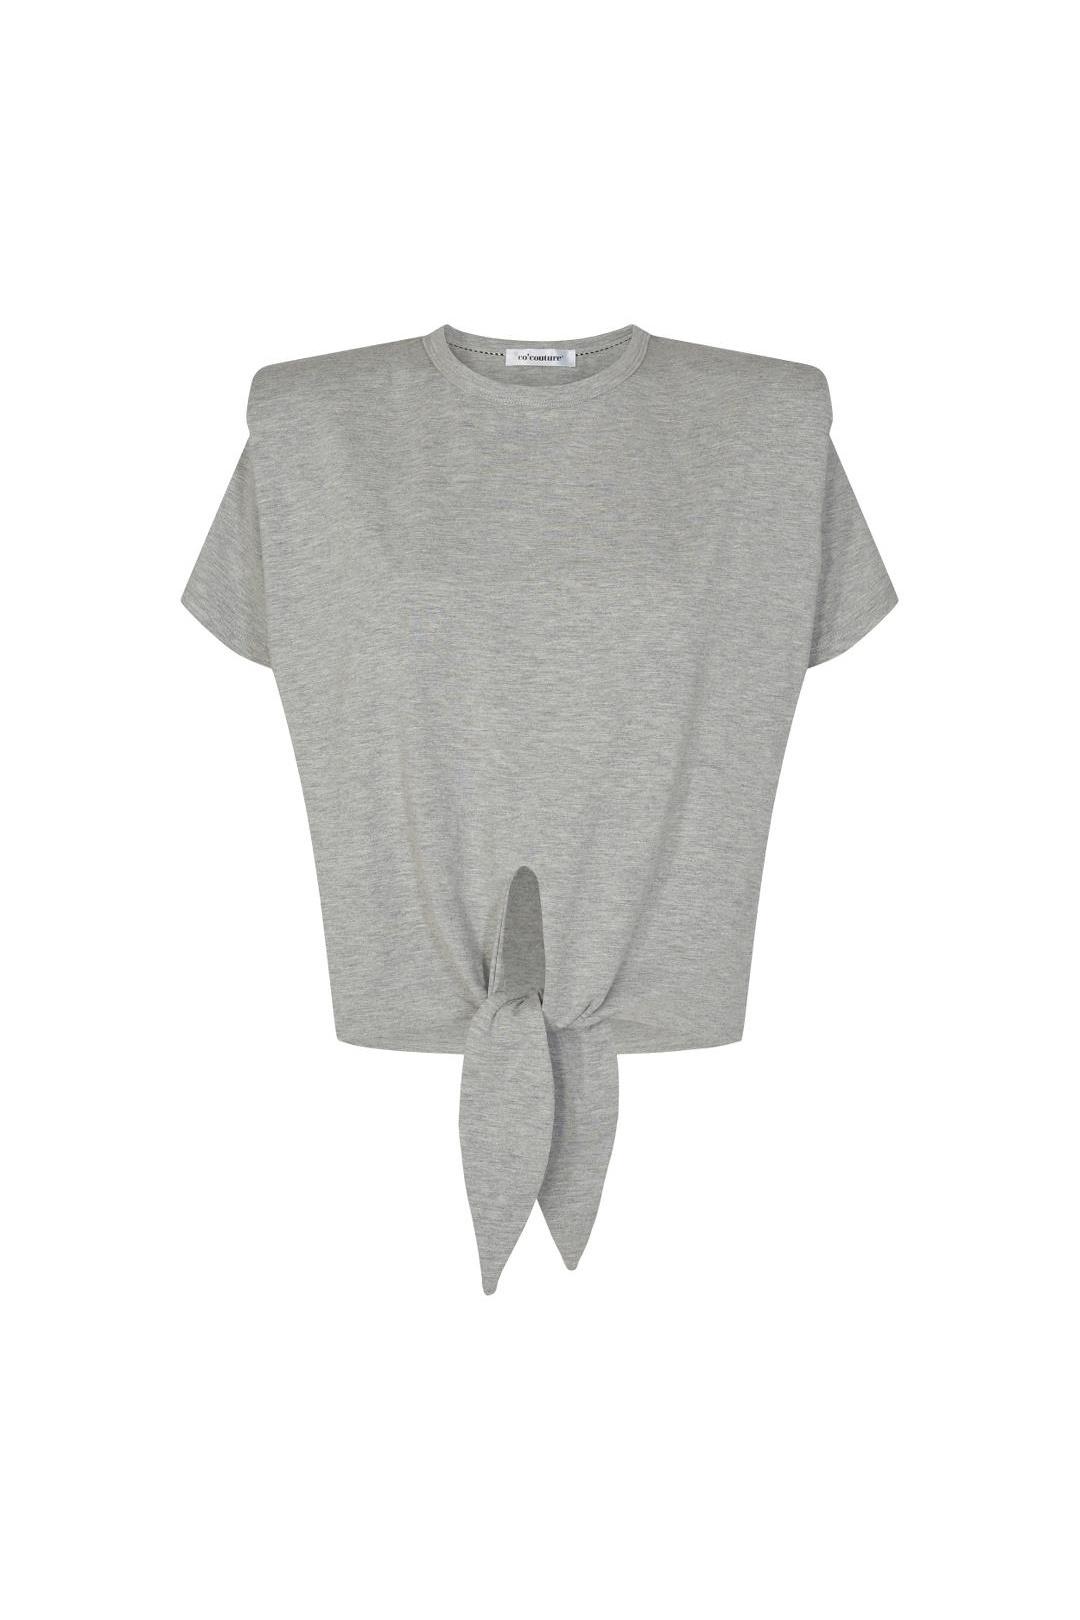 Eduarda Knot Tee - Grey Melange-1